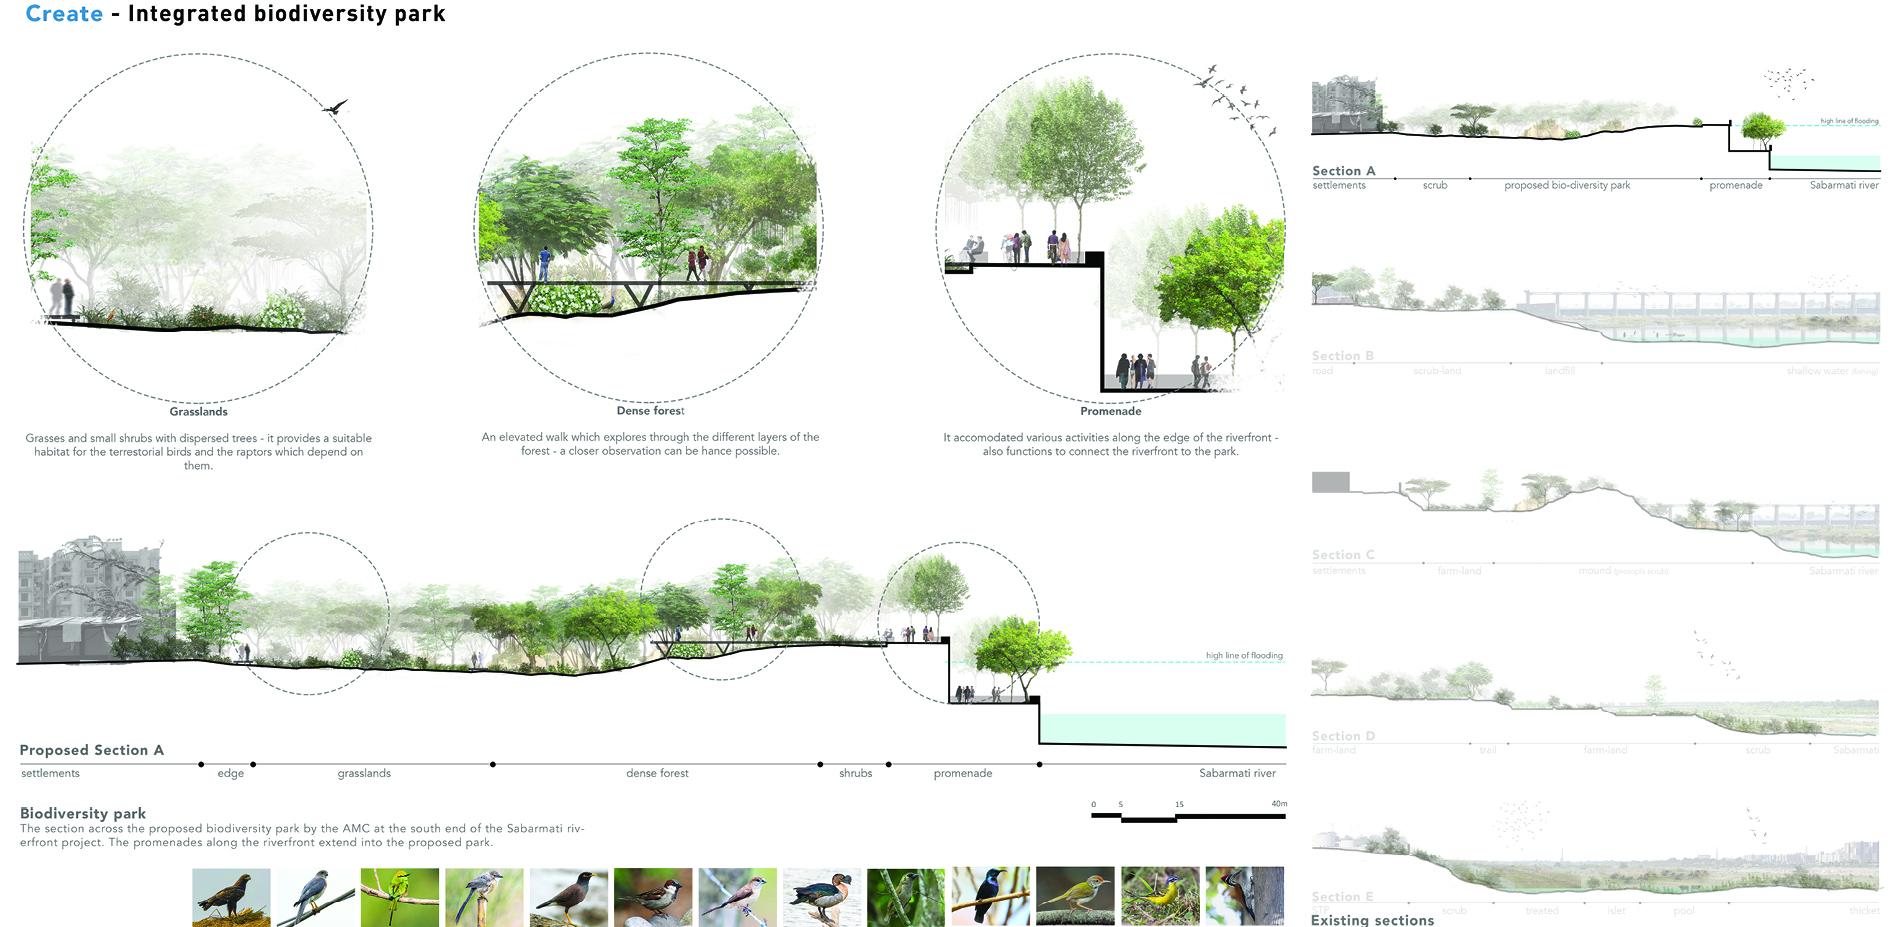 Create - Biodiversity park